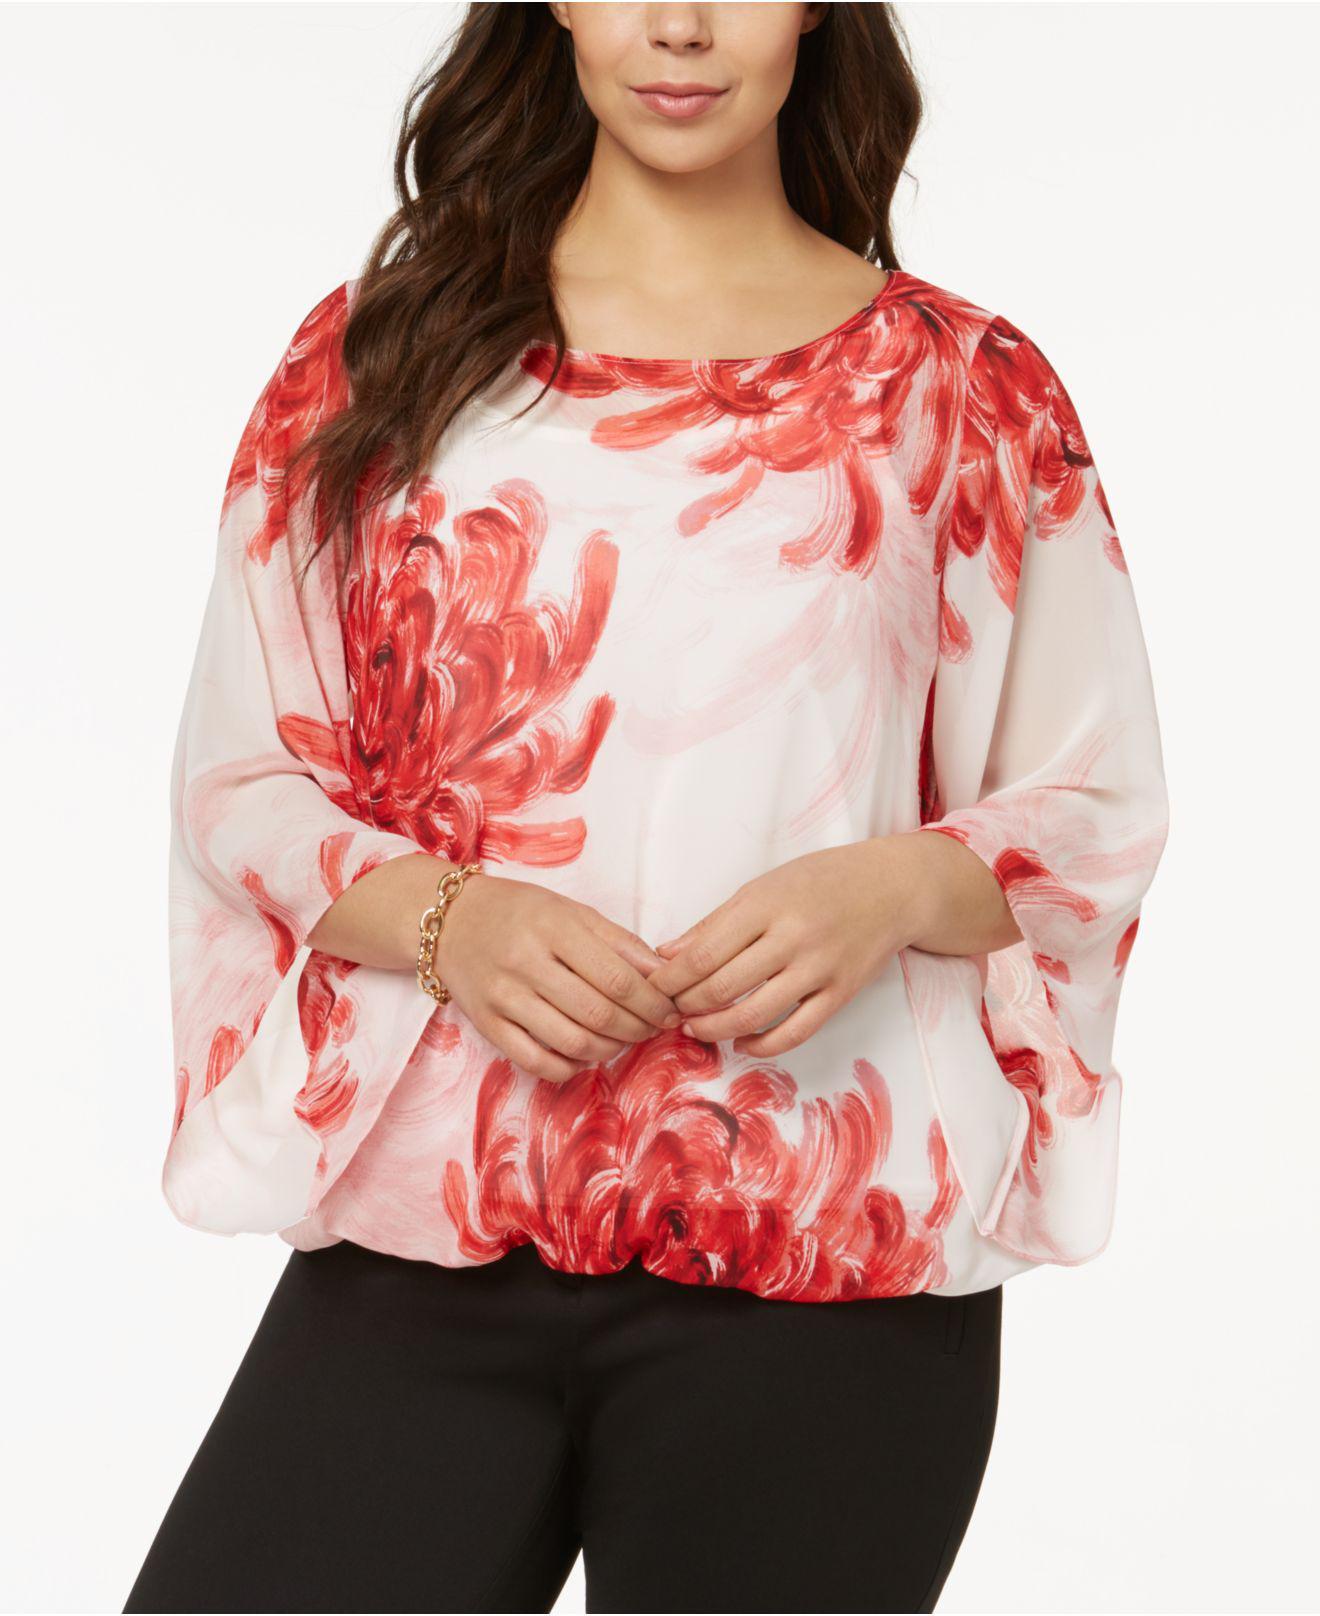 2130267be6f Lyst alfani plus size printed angel sleeve top in red jpg 1320x1616 Plus  size angel tops